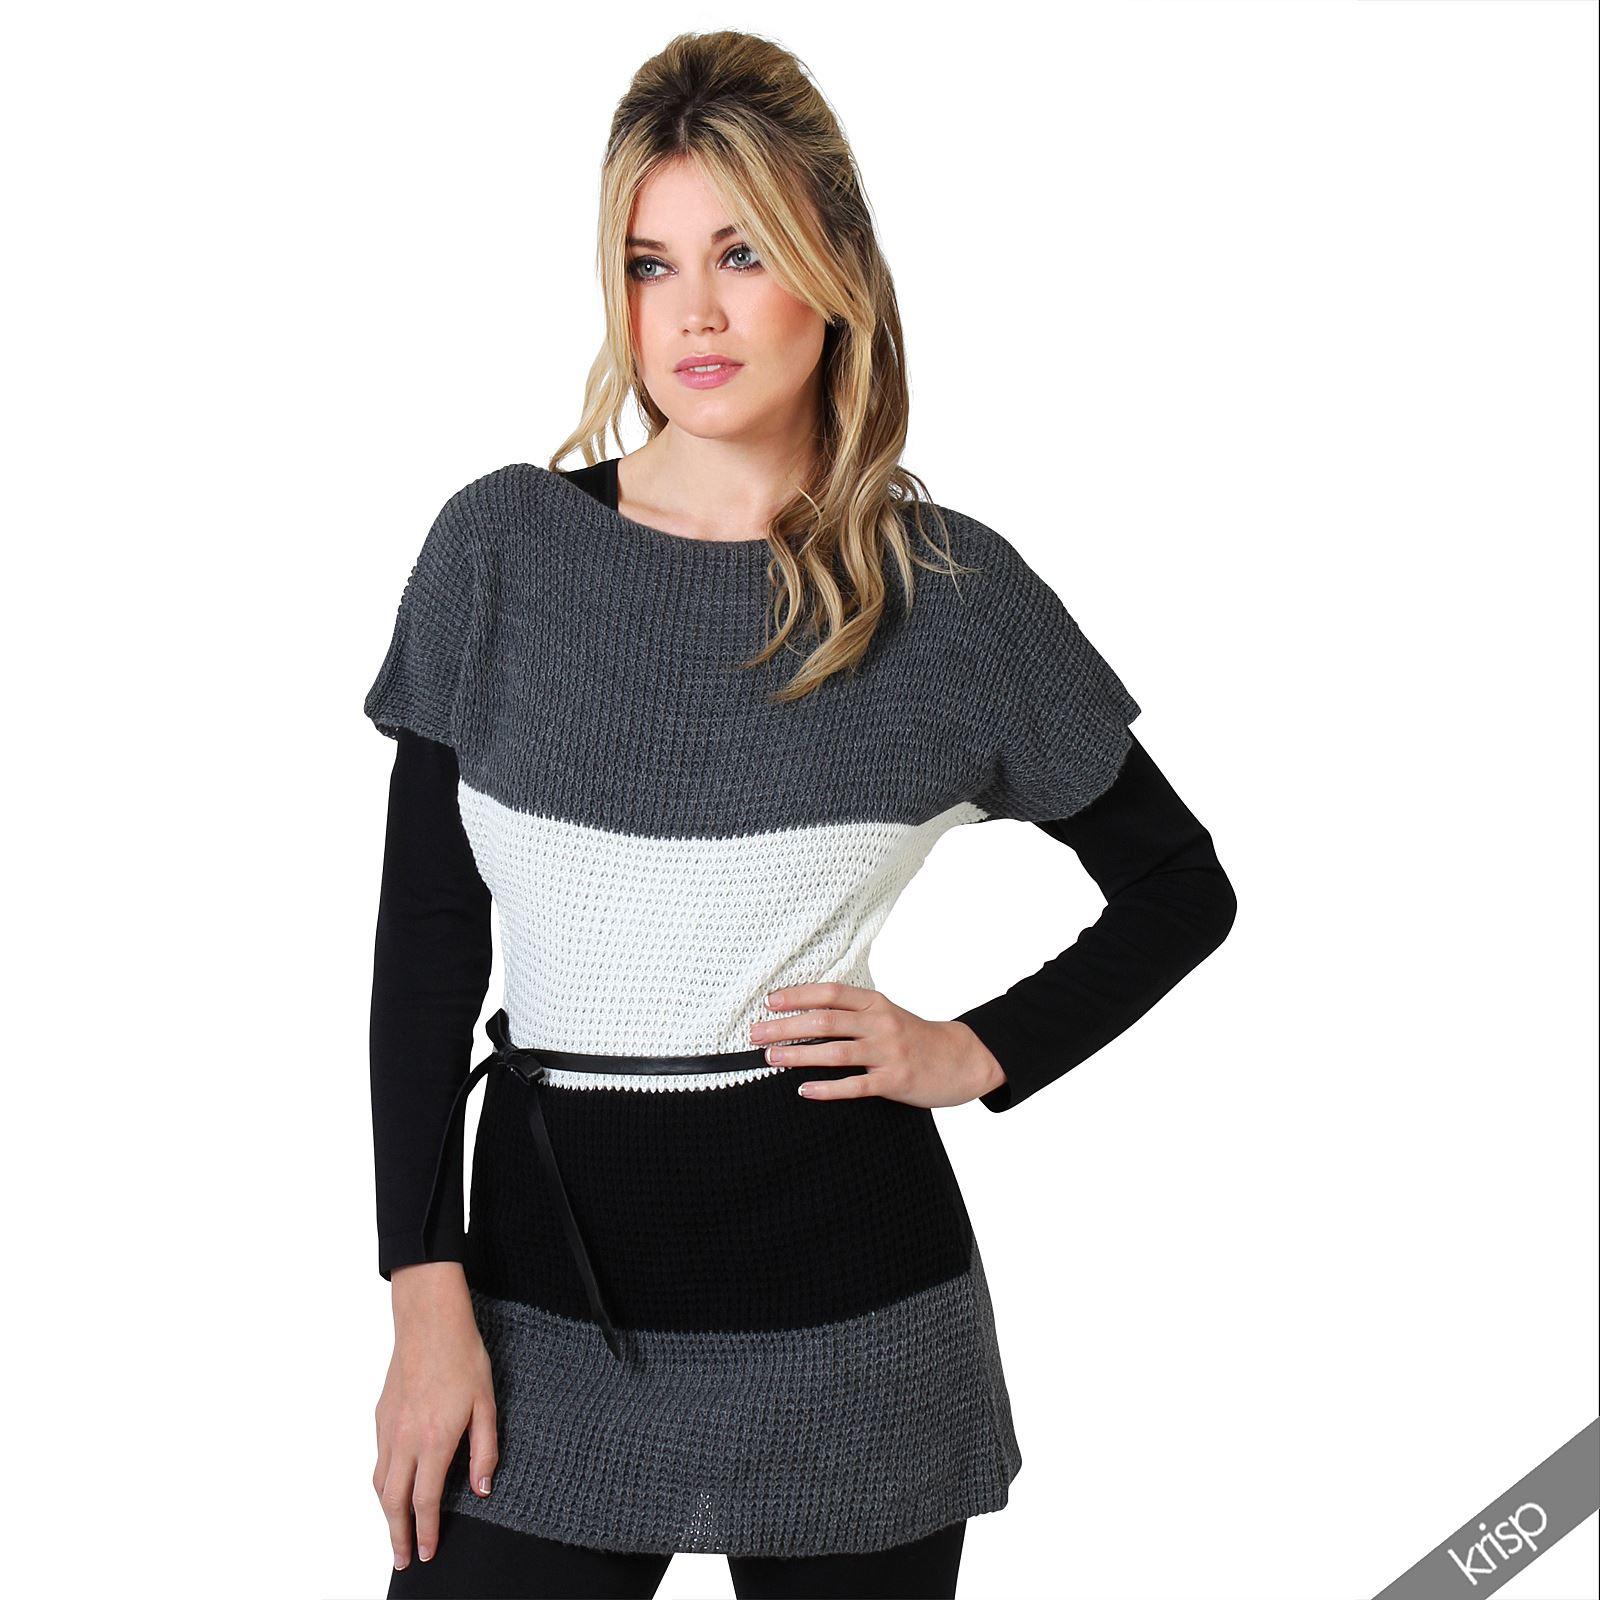 damen rmelloser strickpulli tunika gestreift blockstreifen strick top longtop ebay. Black Bedroom Furniture Sets. Home Design Ideas